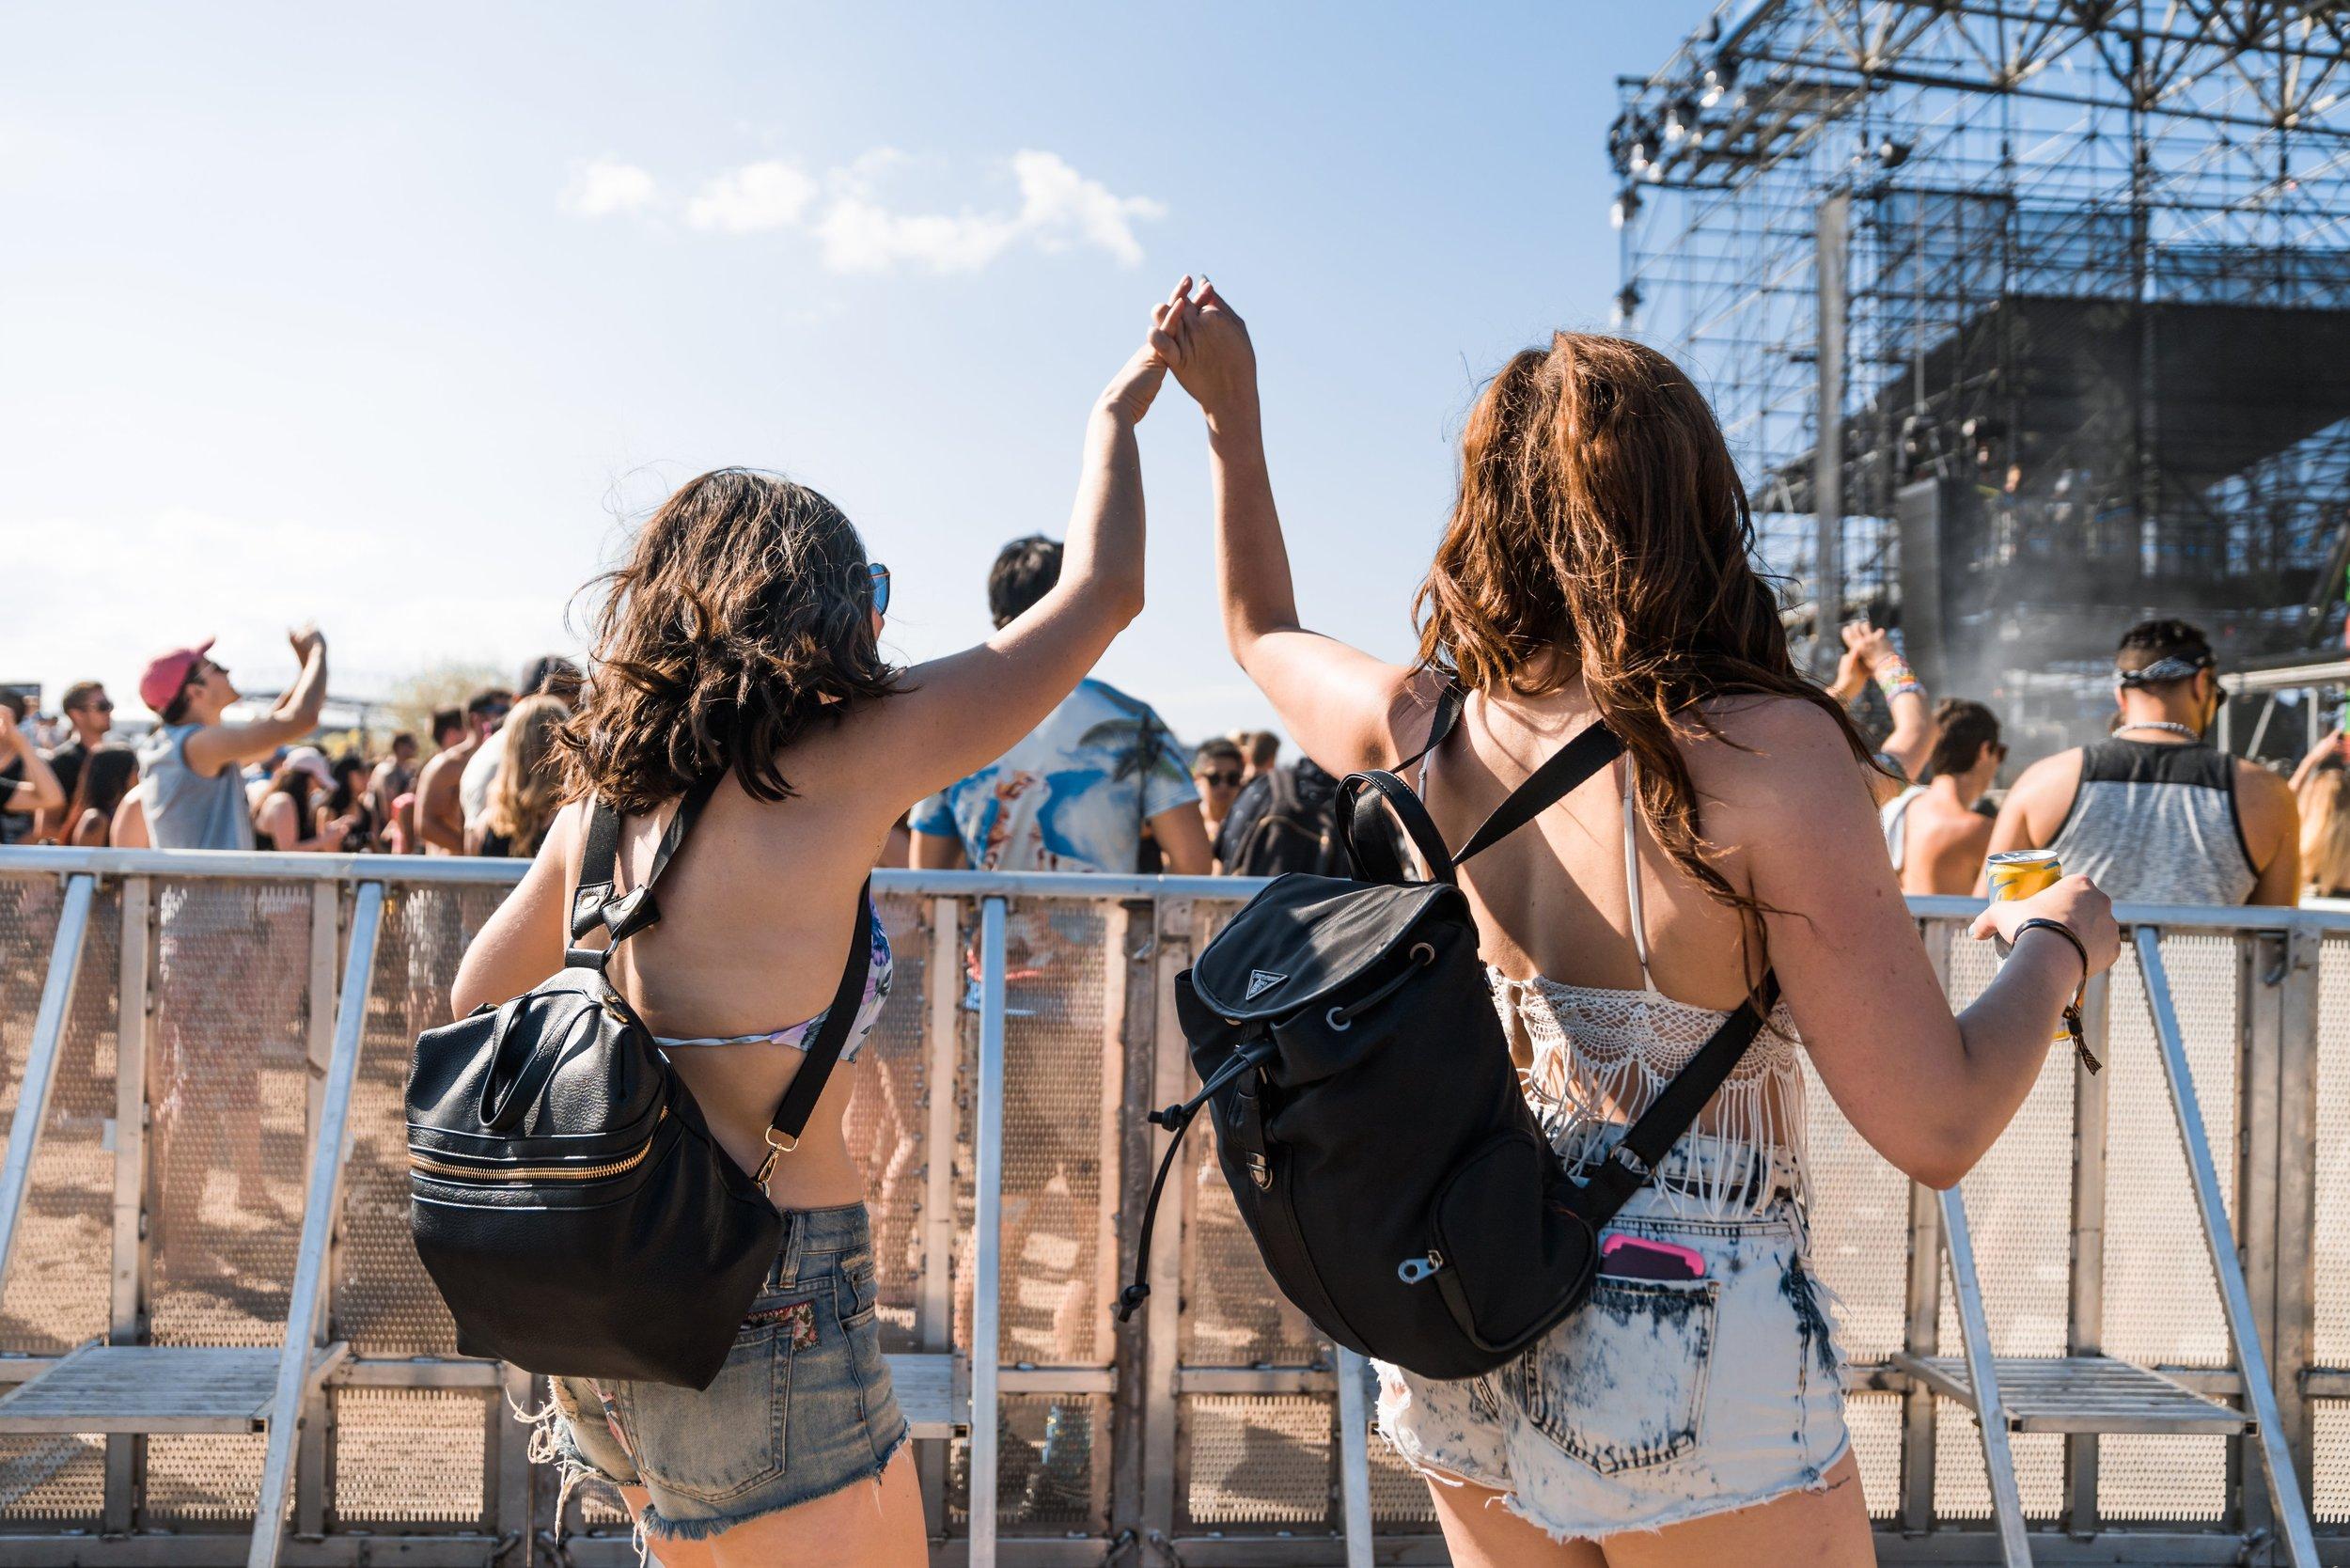 concert-goers-hold-hands_4460x4460.jpg